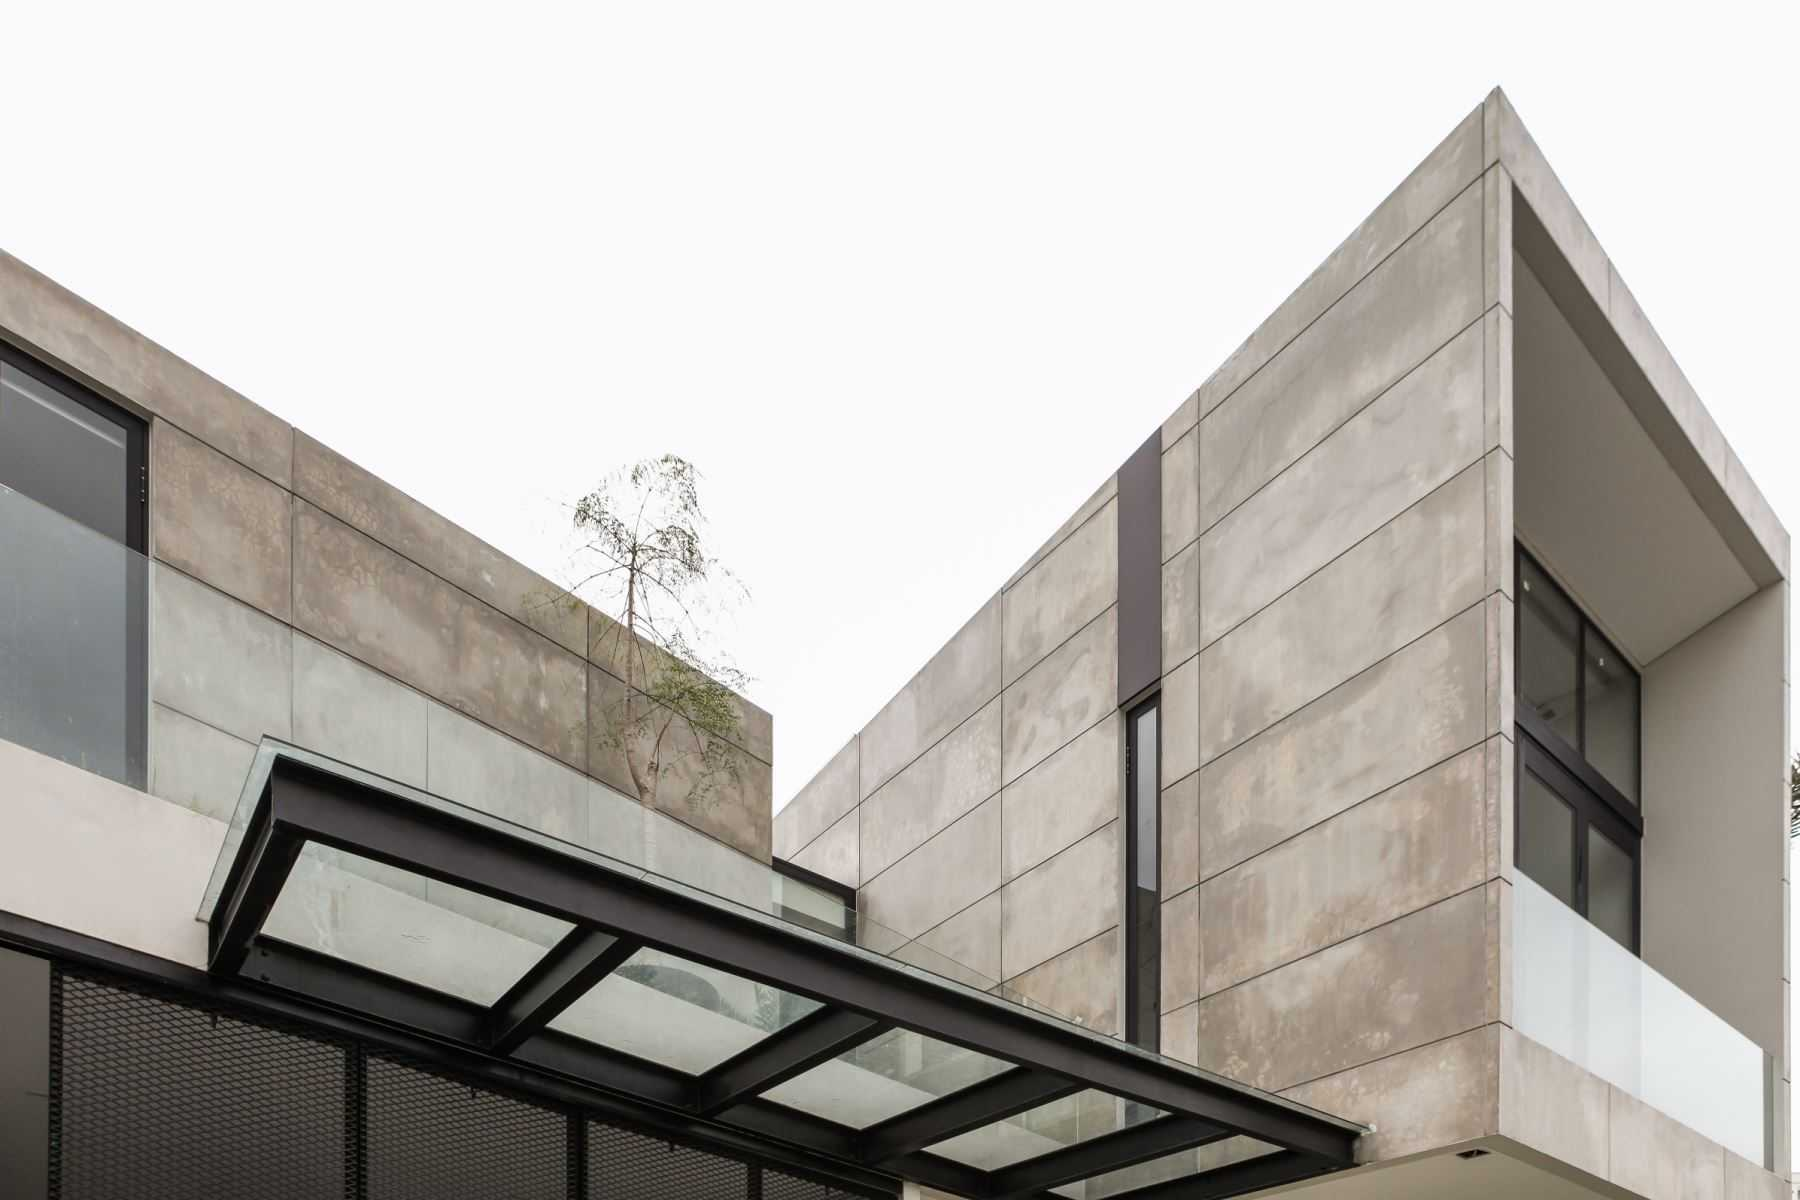 Ivan Priatman Architecture Rl House Surabaya, Kota Sby, Jawa Timur, Indonesia Surabaya, Kota Sby, Jawa Timur, Indonesia Ivan-Priatman-Architecture-Rl-House   59097